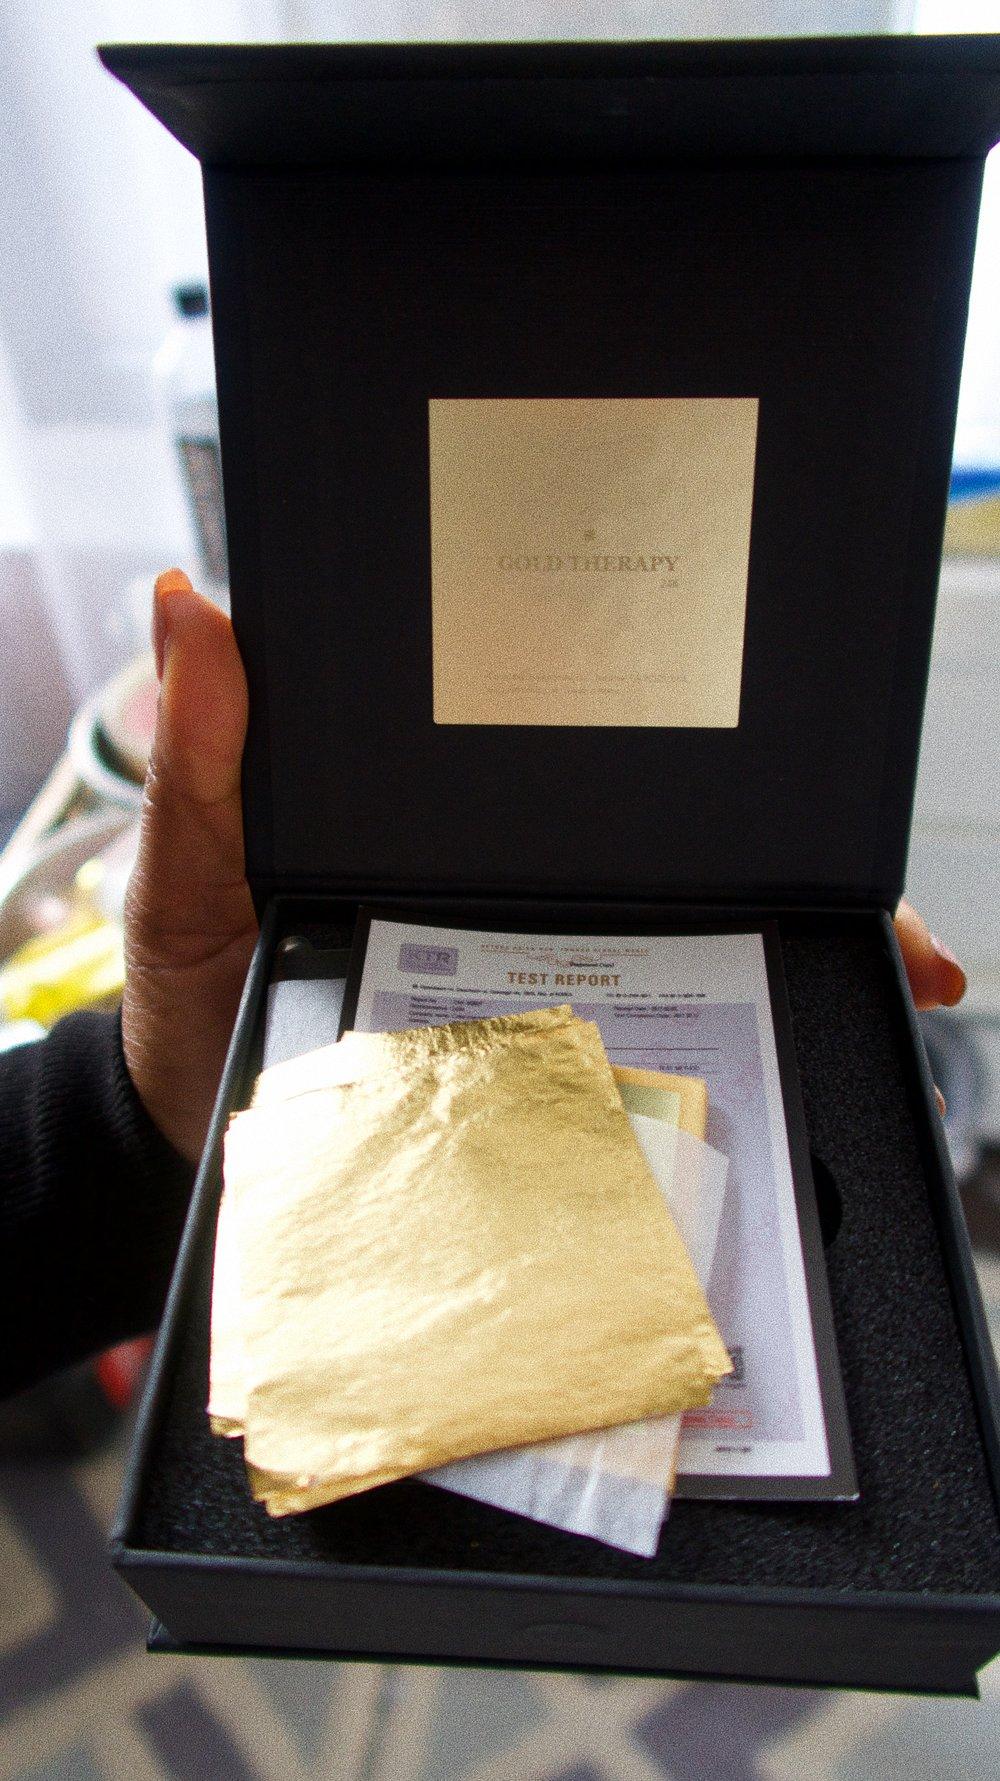 24 KT Gold foil used for facial